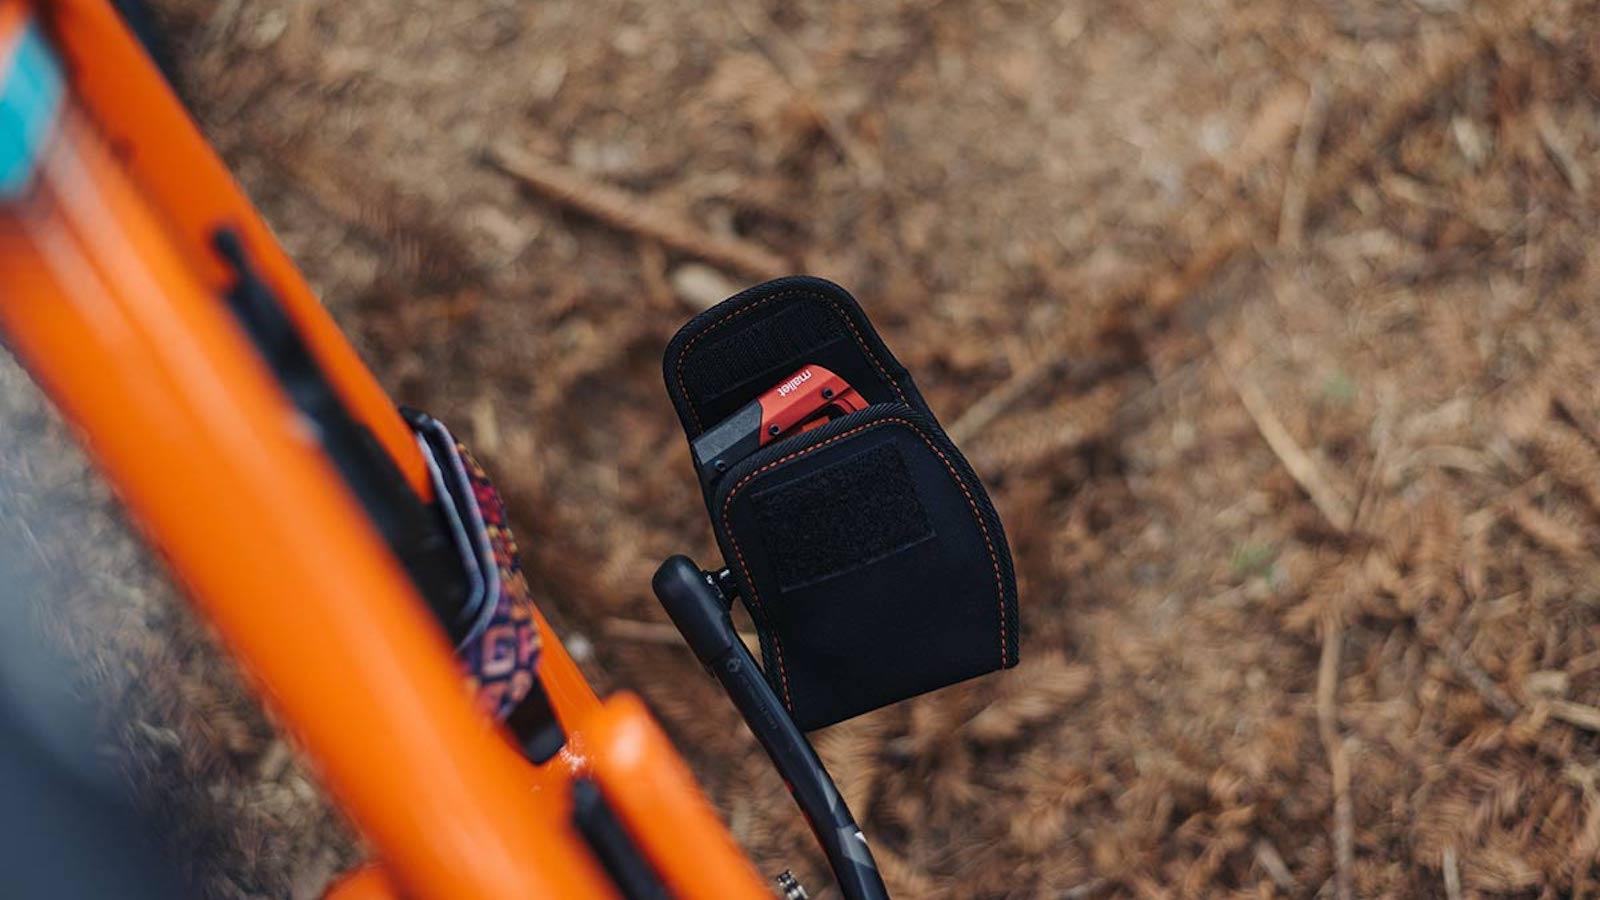 Granite Design PITA Pedal Cover bike protector